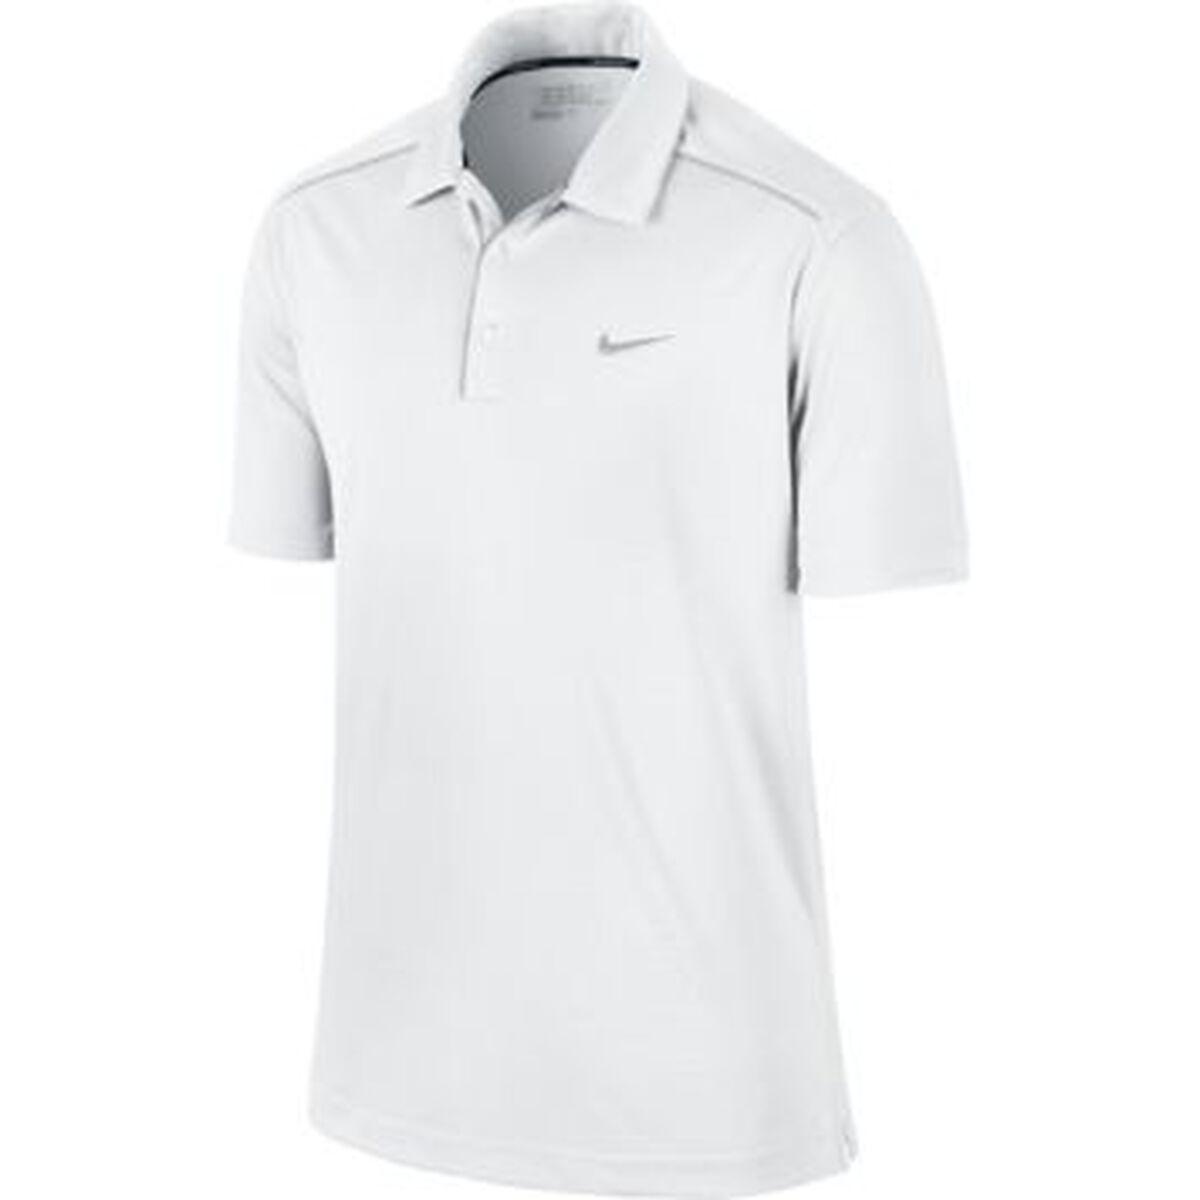 d150598a19 Nike Short Sleeve Key Iconic Polo 2.0 - White